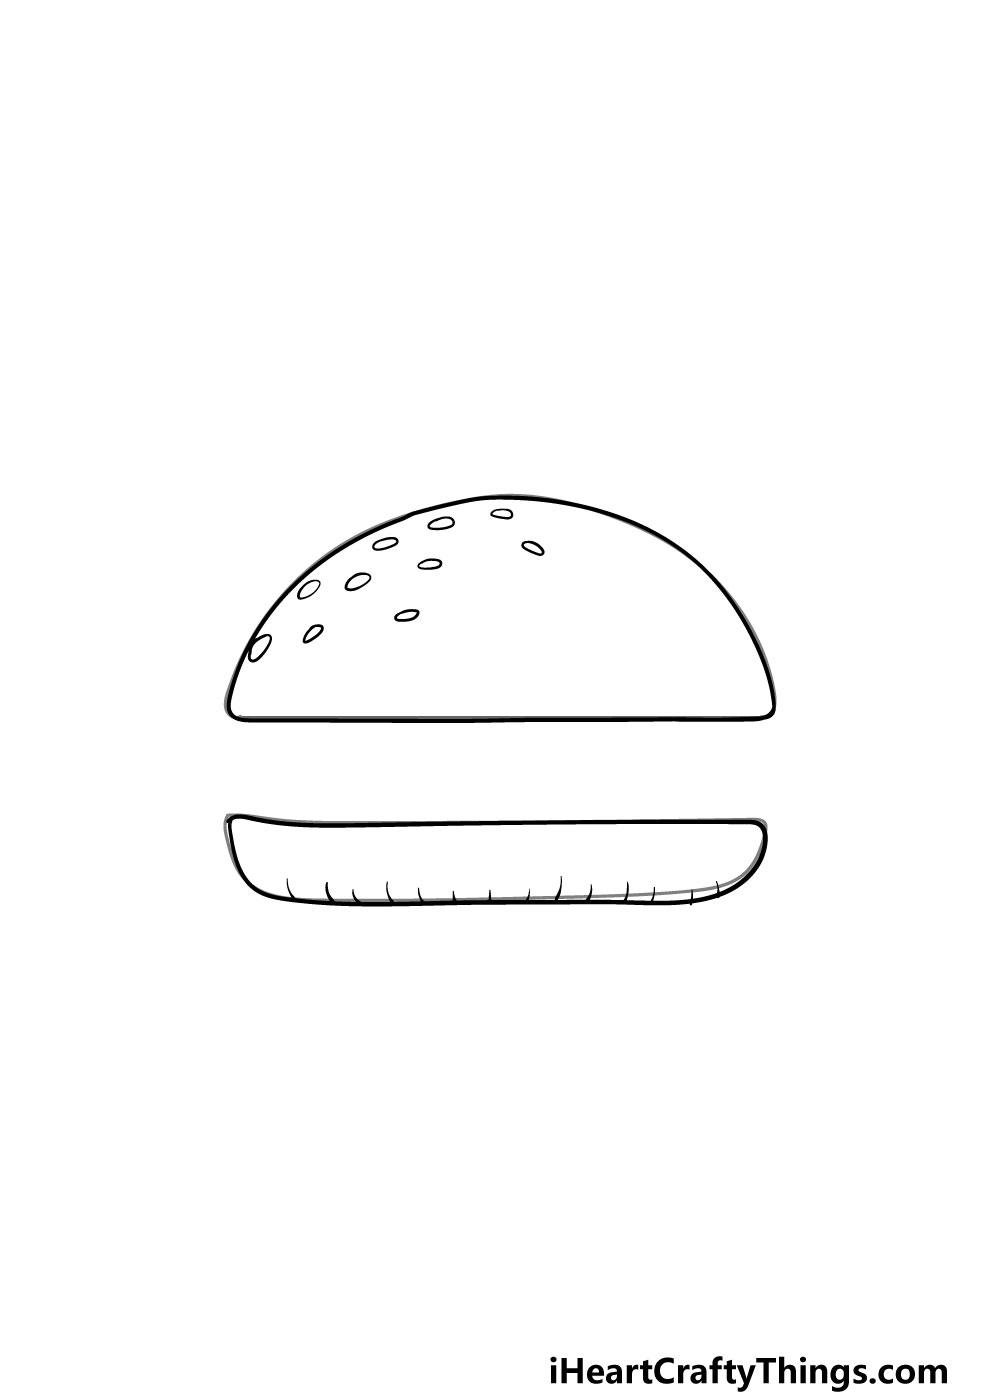 drawing a bun step 4